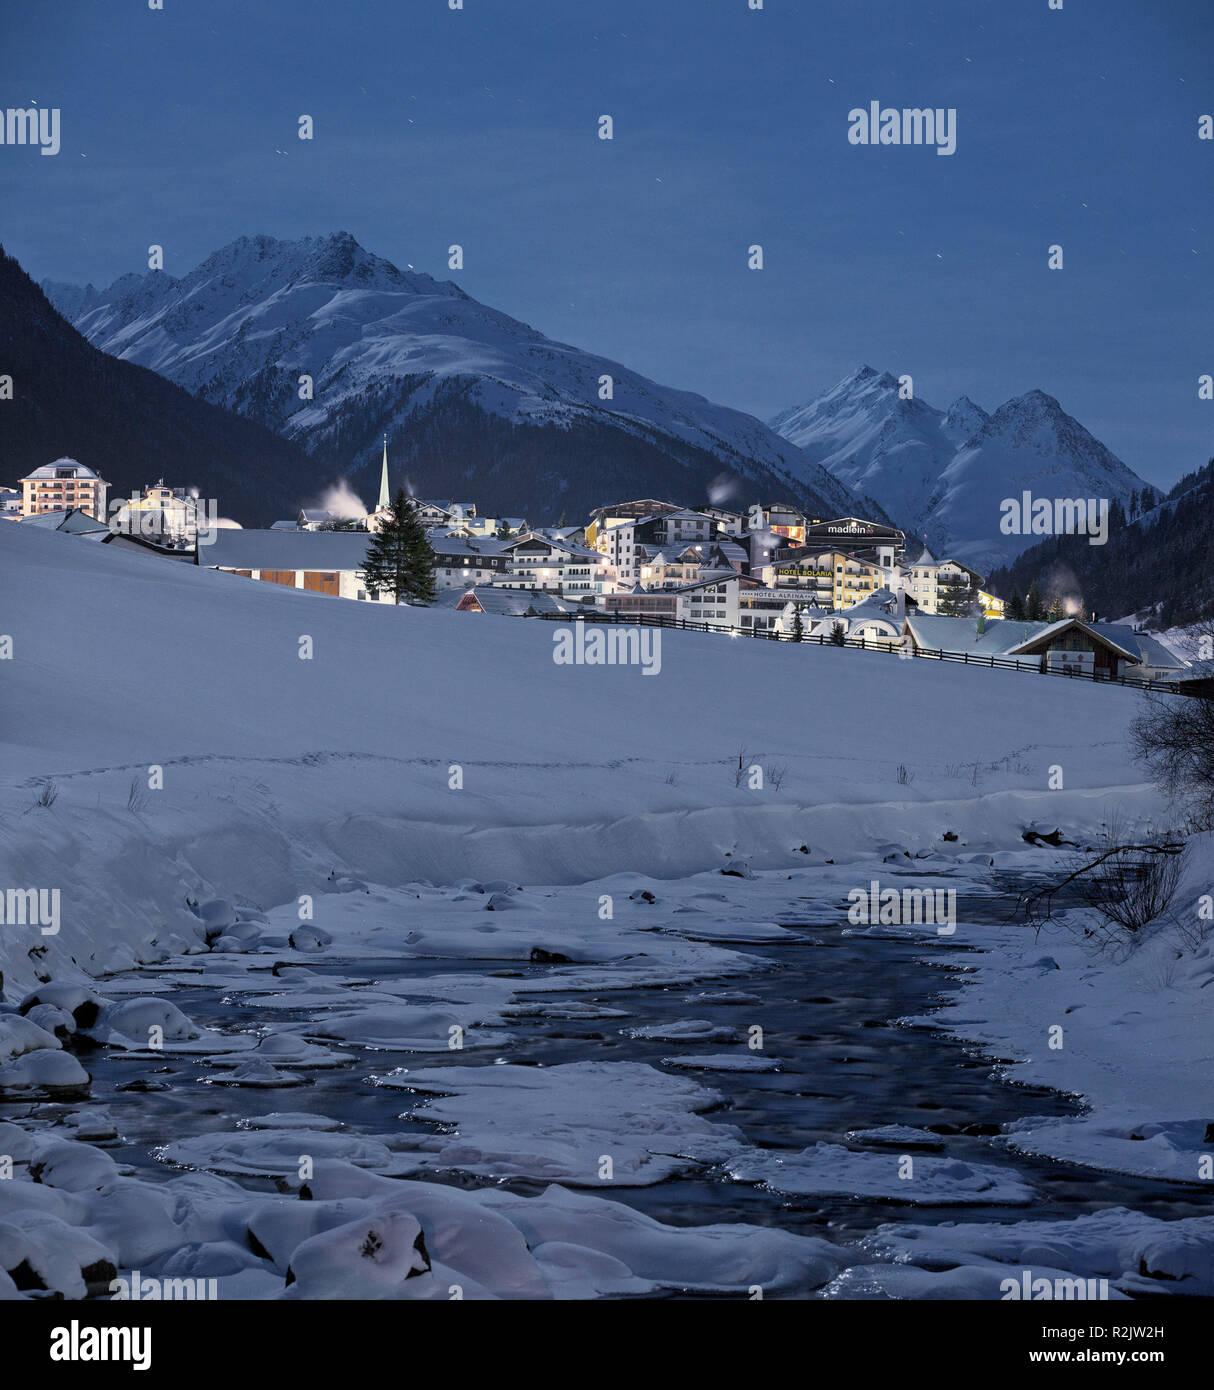 Austria, Tyrol, Ischgl, full moon night - Stock Image